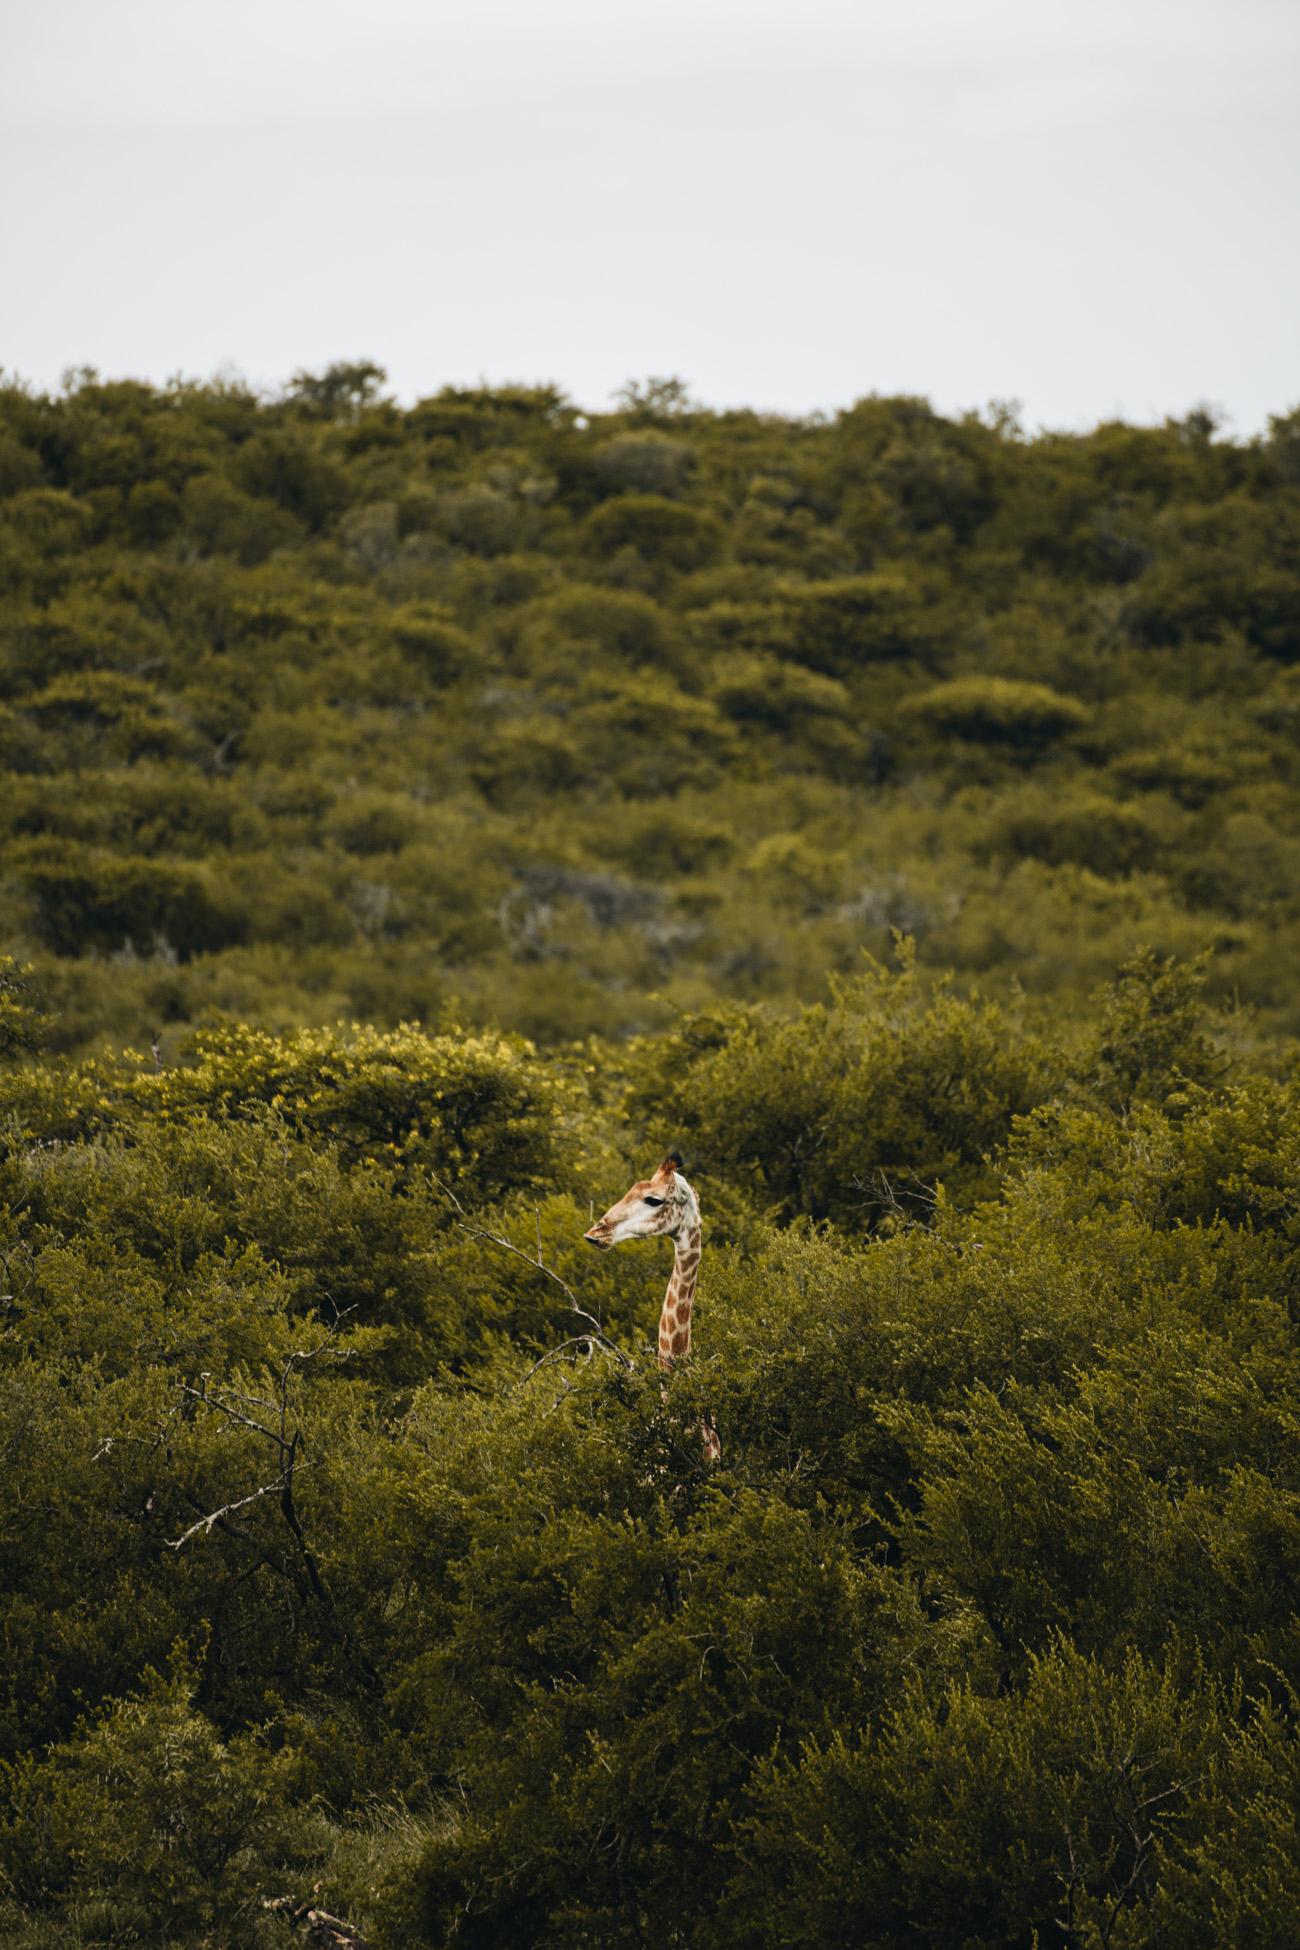 Safari in Durban